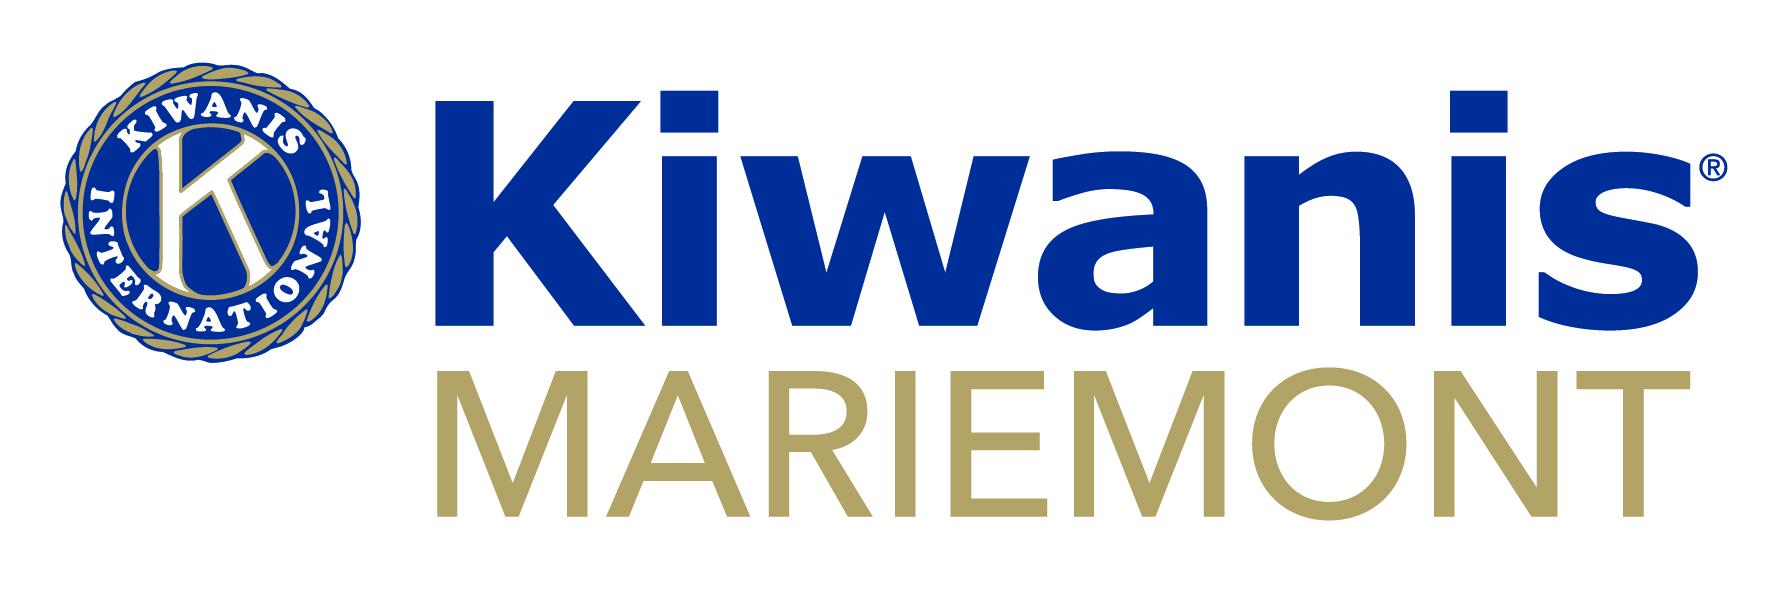 Mariemont Kiwanis Logo